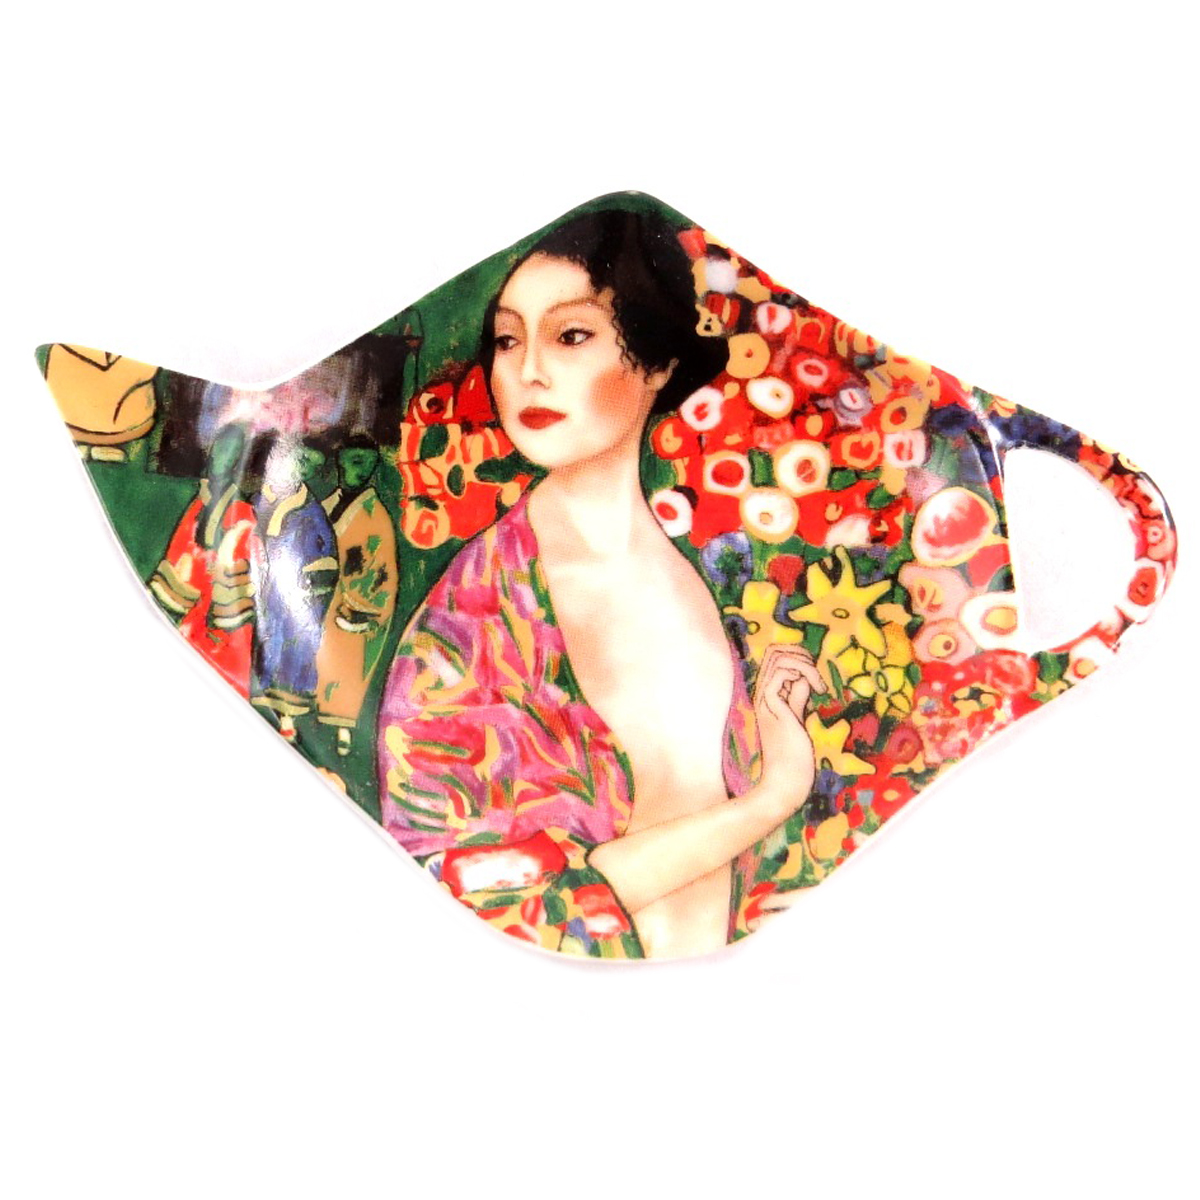 Repose sachets \'Gustav Klimt\' (the Dancer) - 14x95 cm - [Q0193]